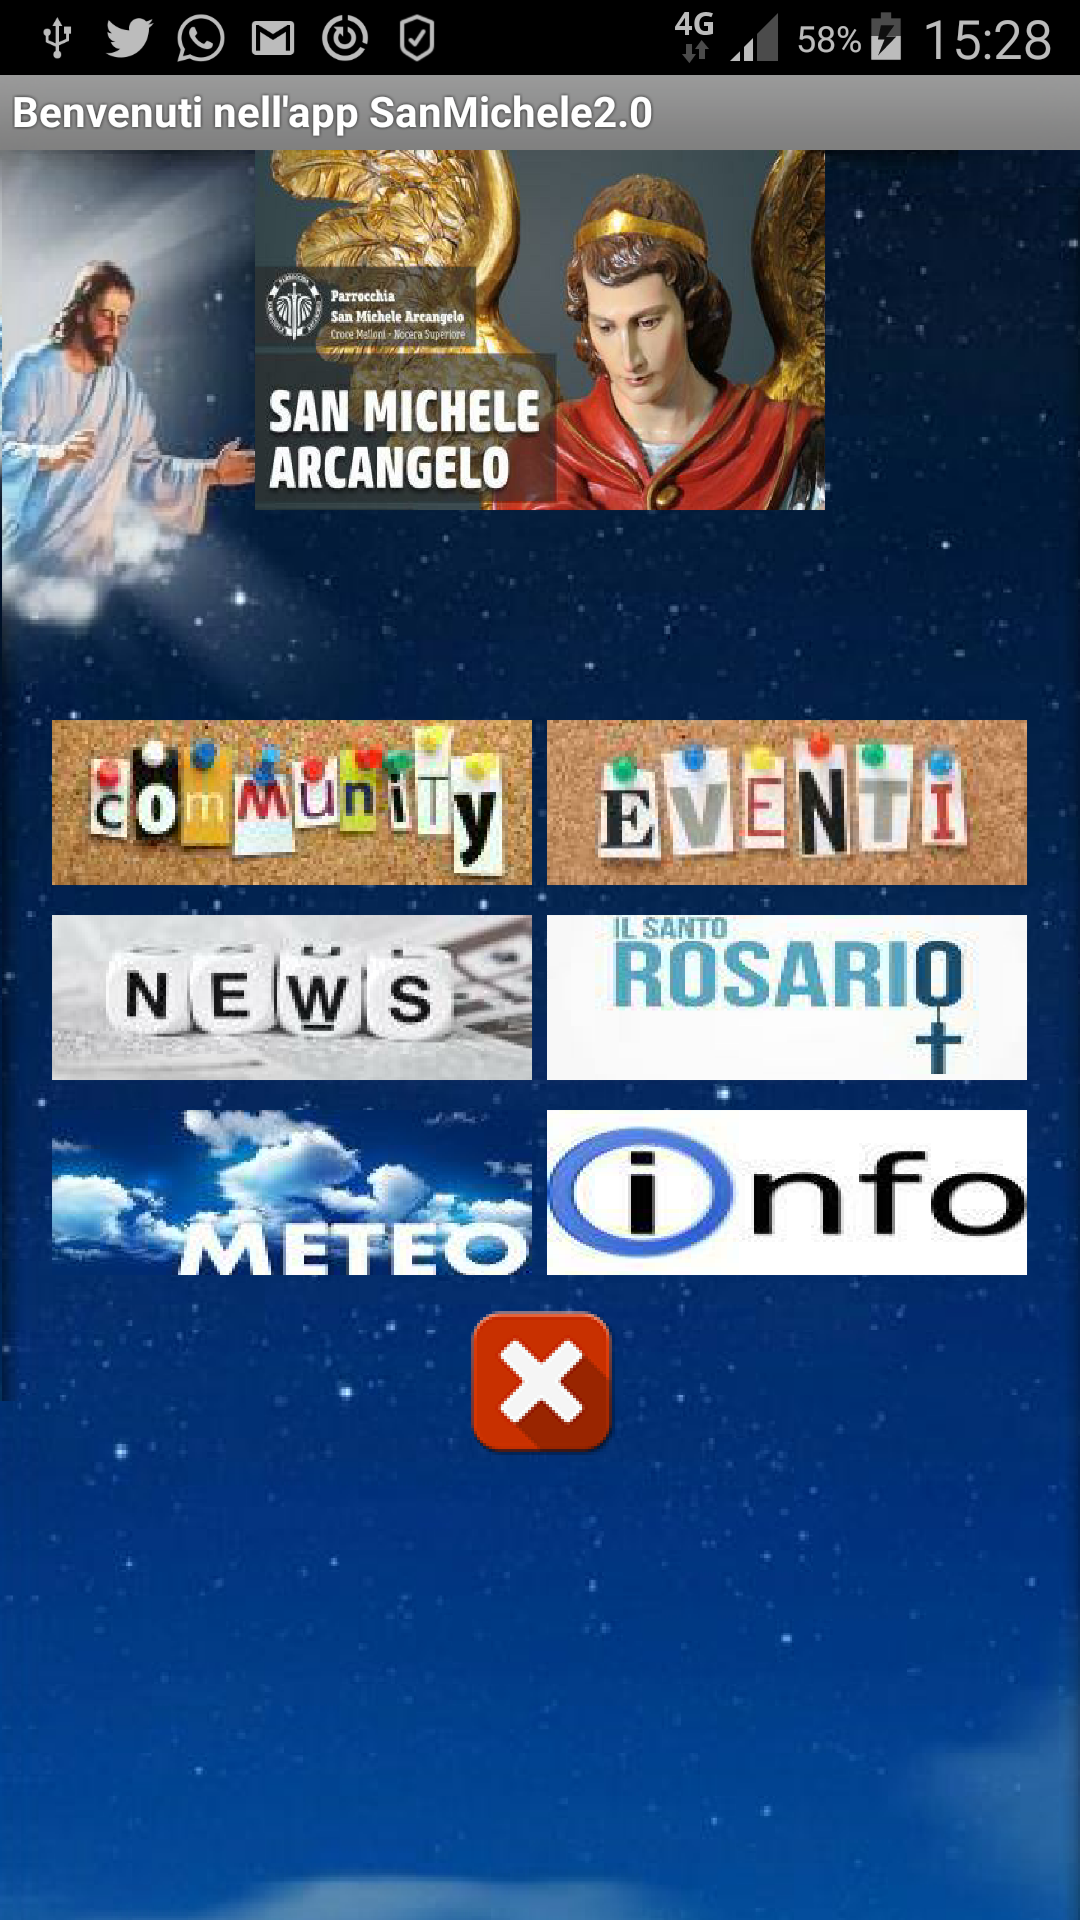 SanMichele2.0